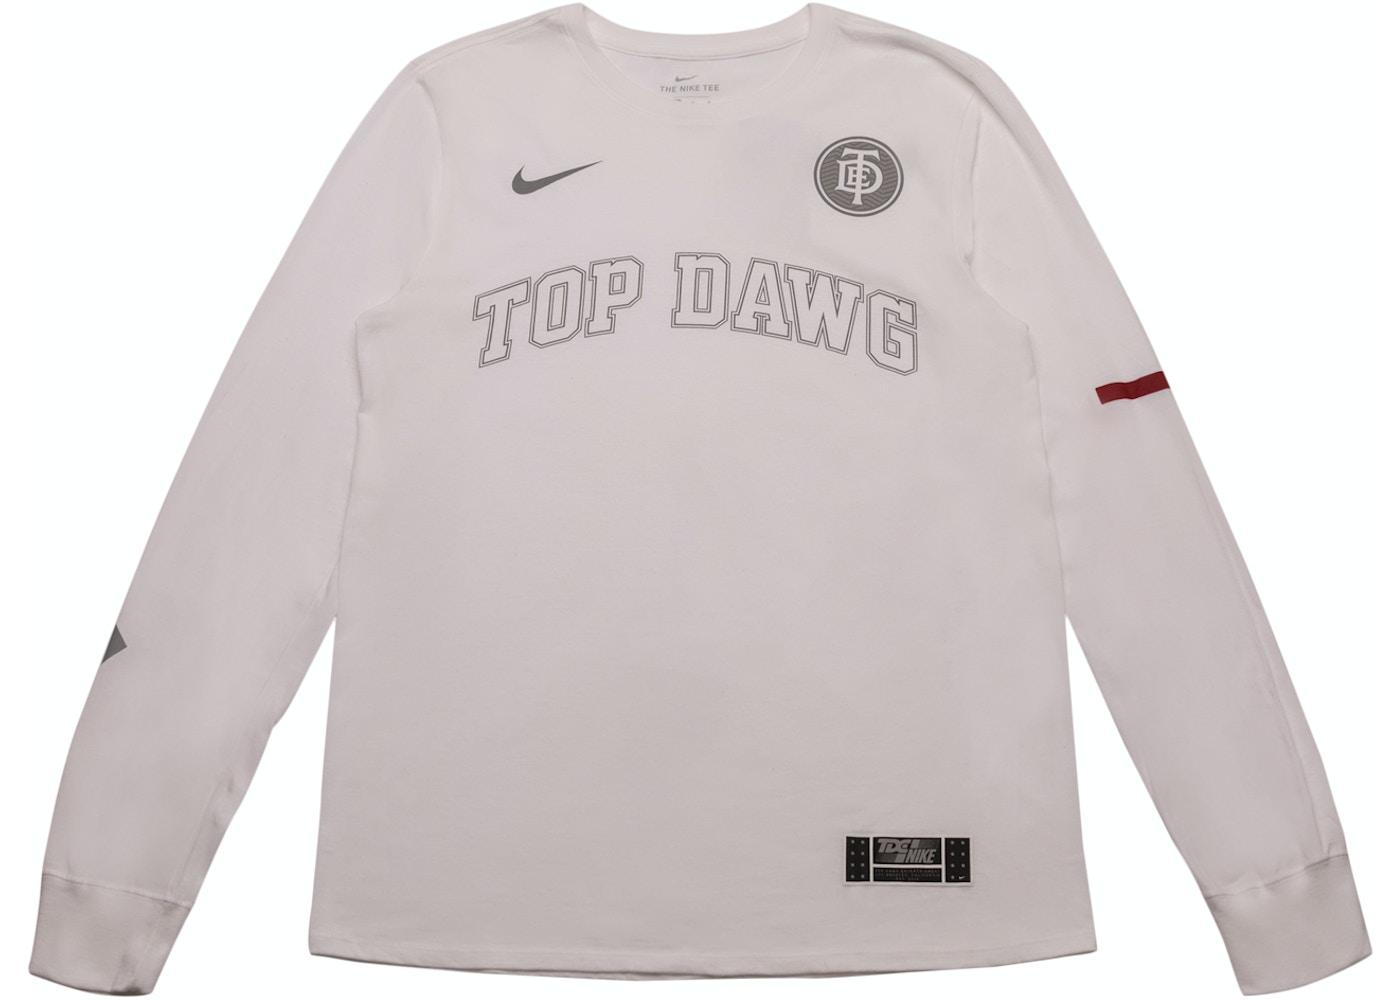 a03595c2 TDE x Nike Top Dawg Arc Long Sleeve TDE White - SS18